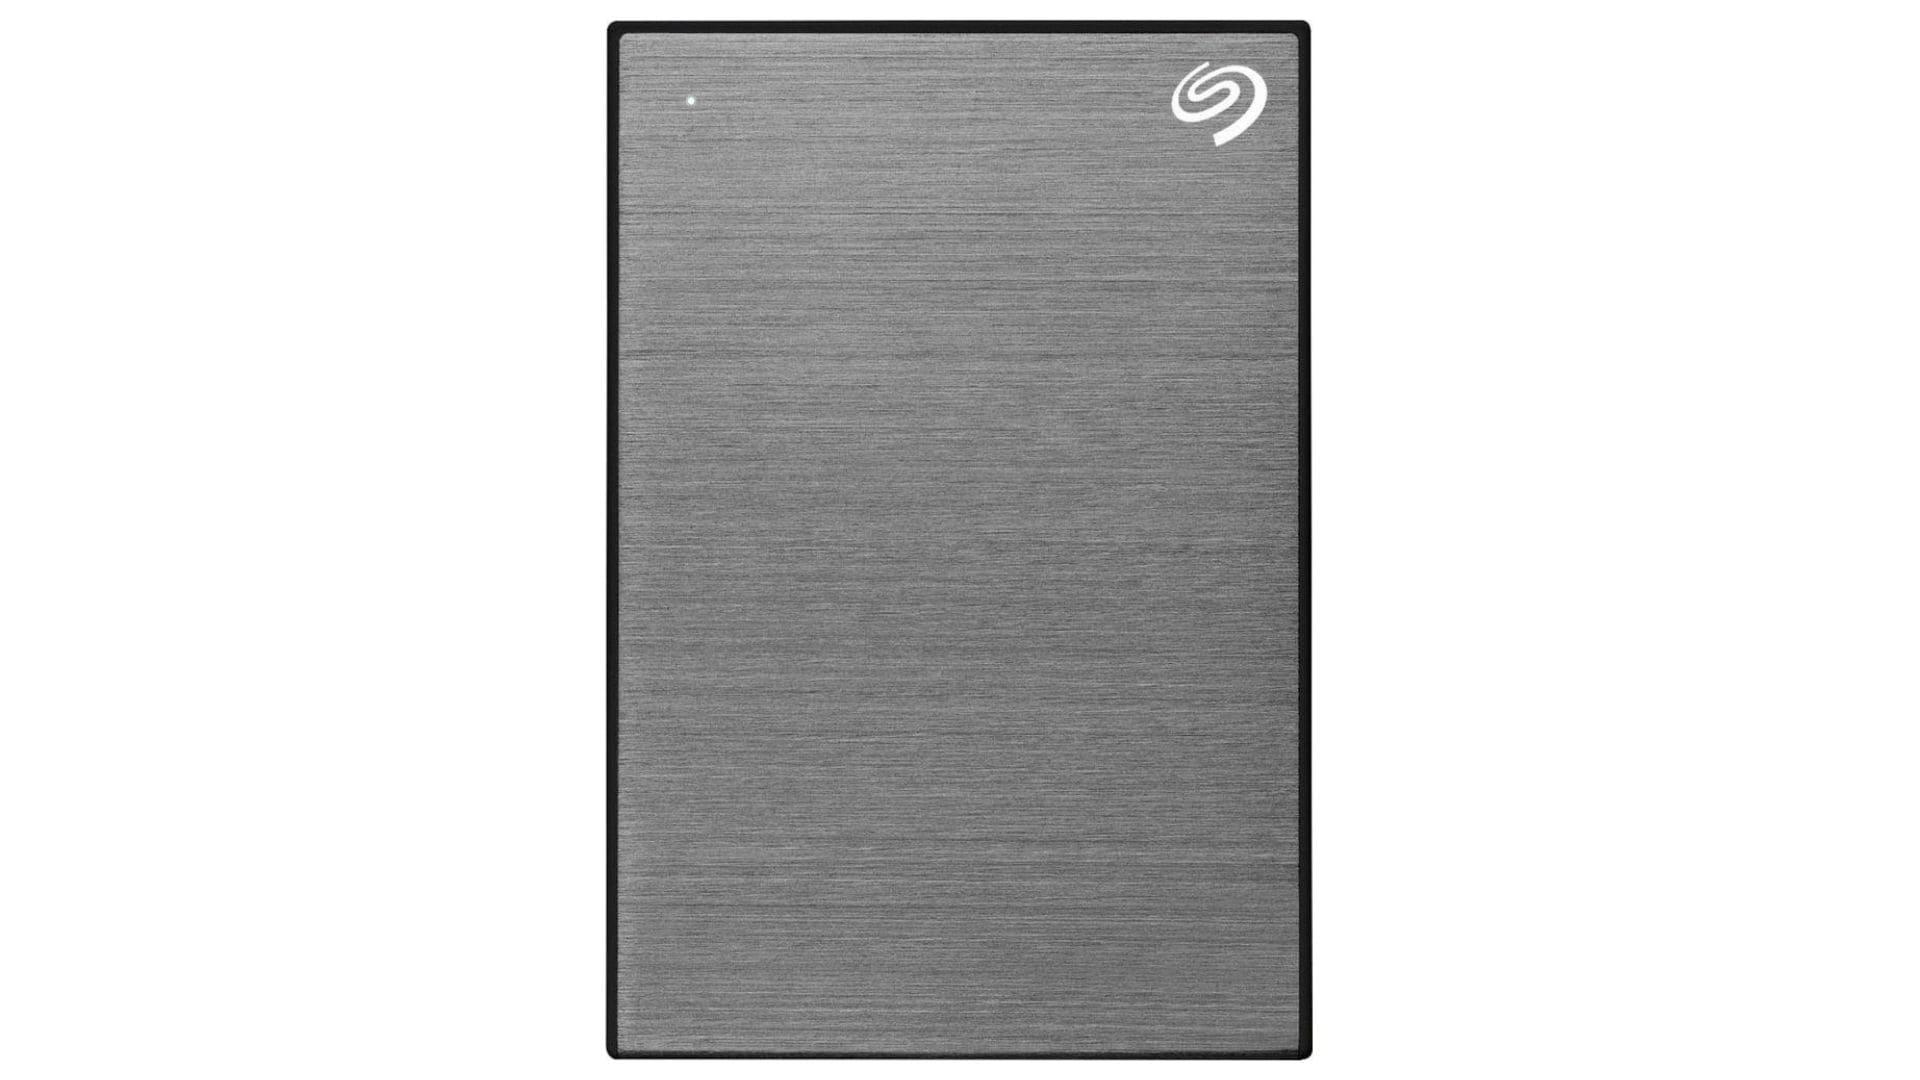 HD externo 1TB Seagate Portátil Plus SLIM